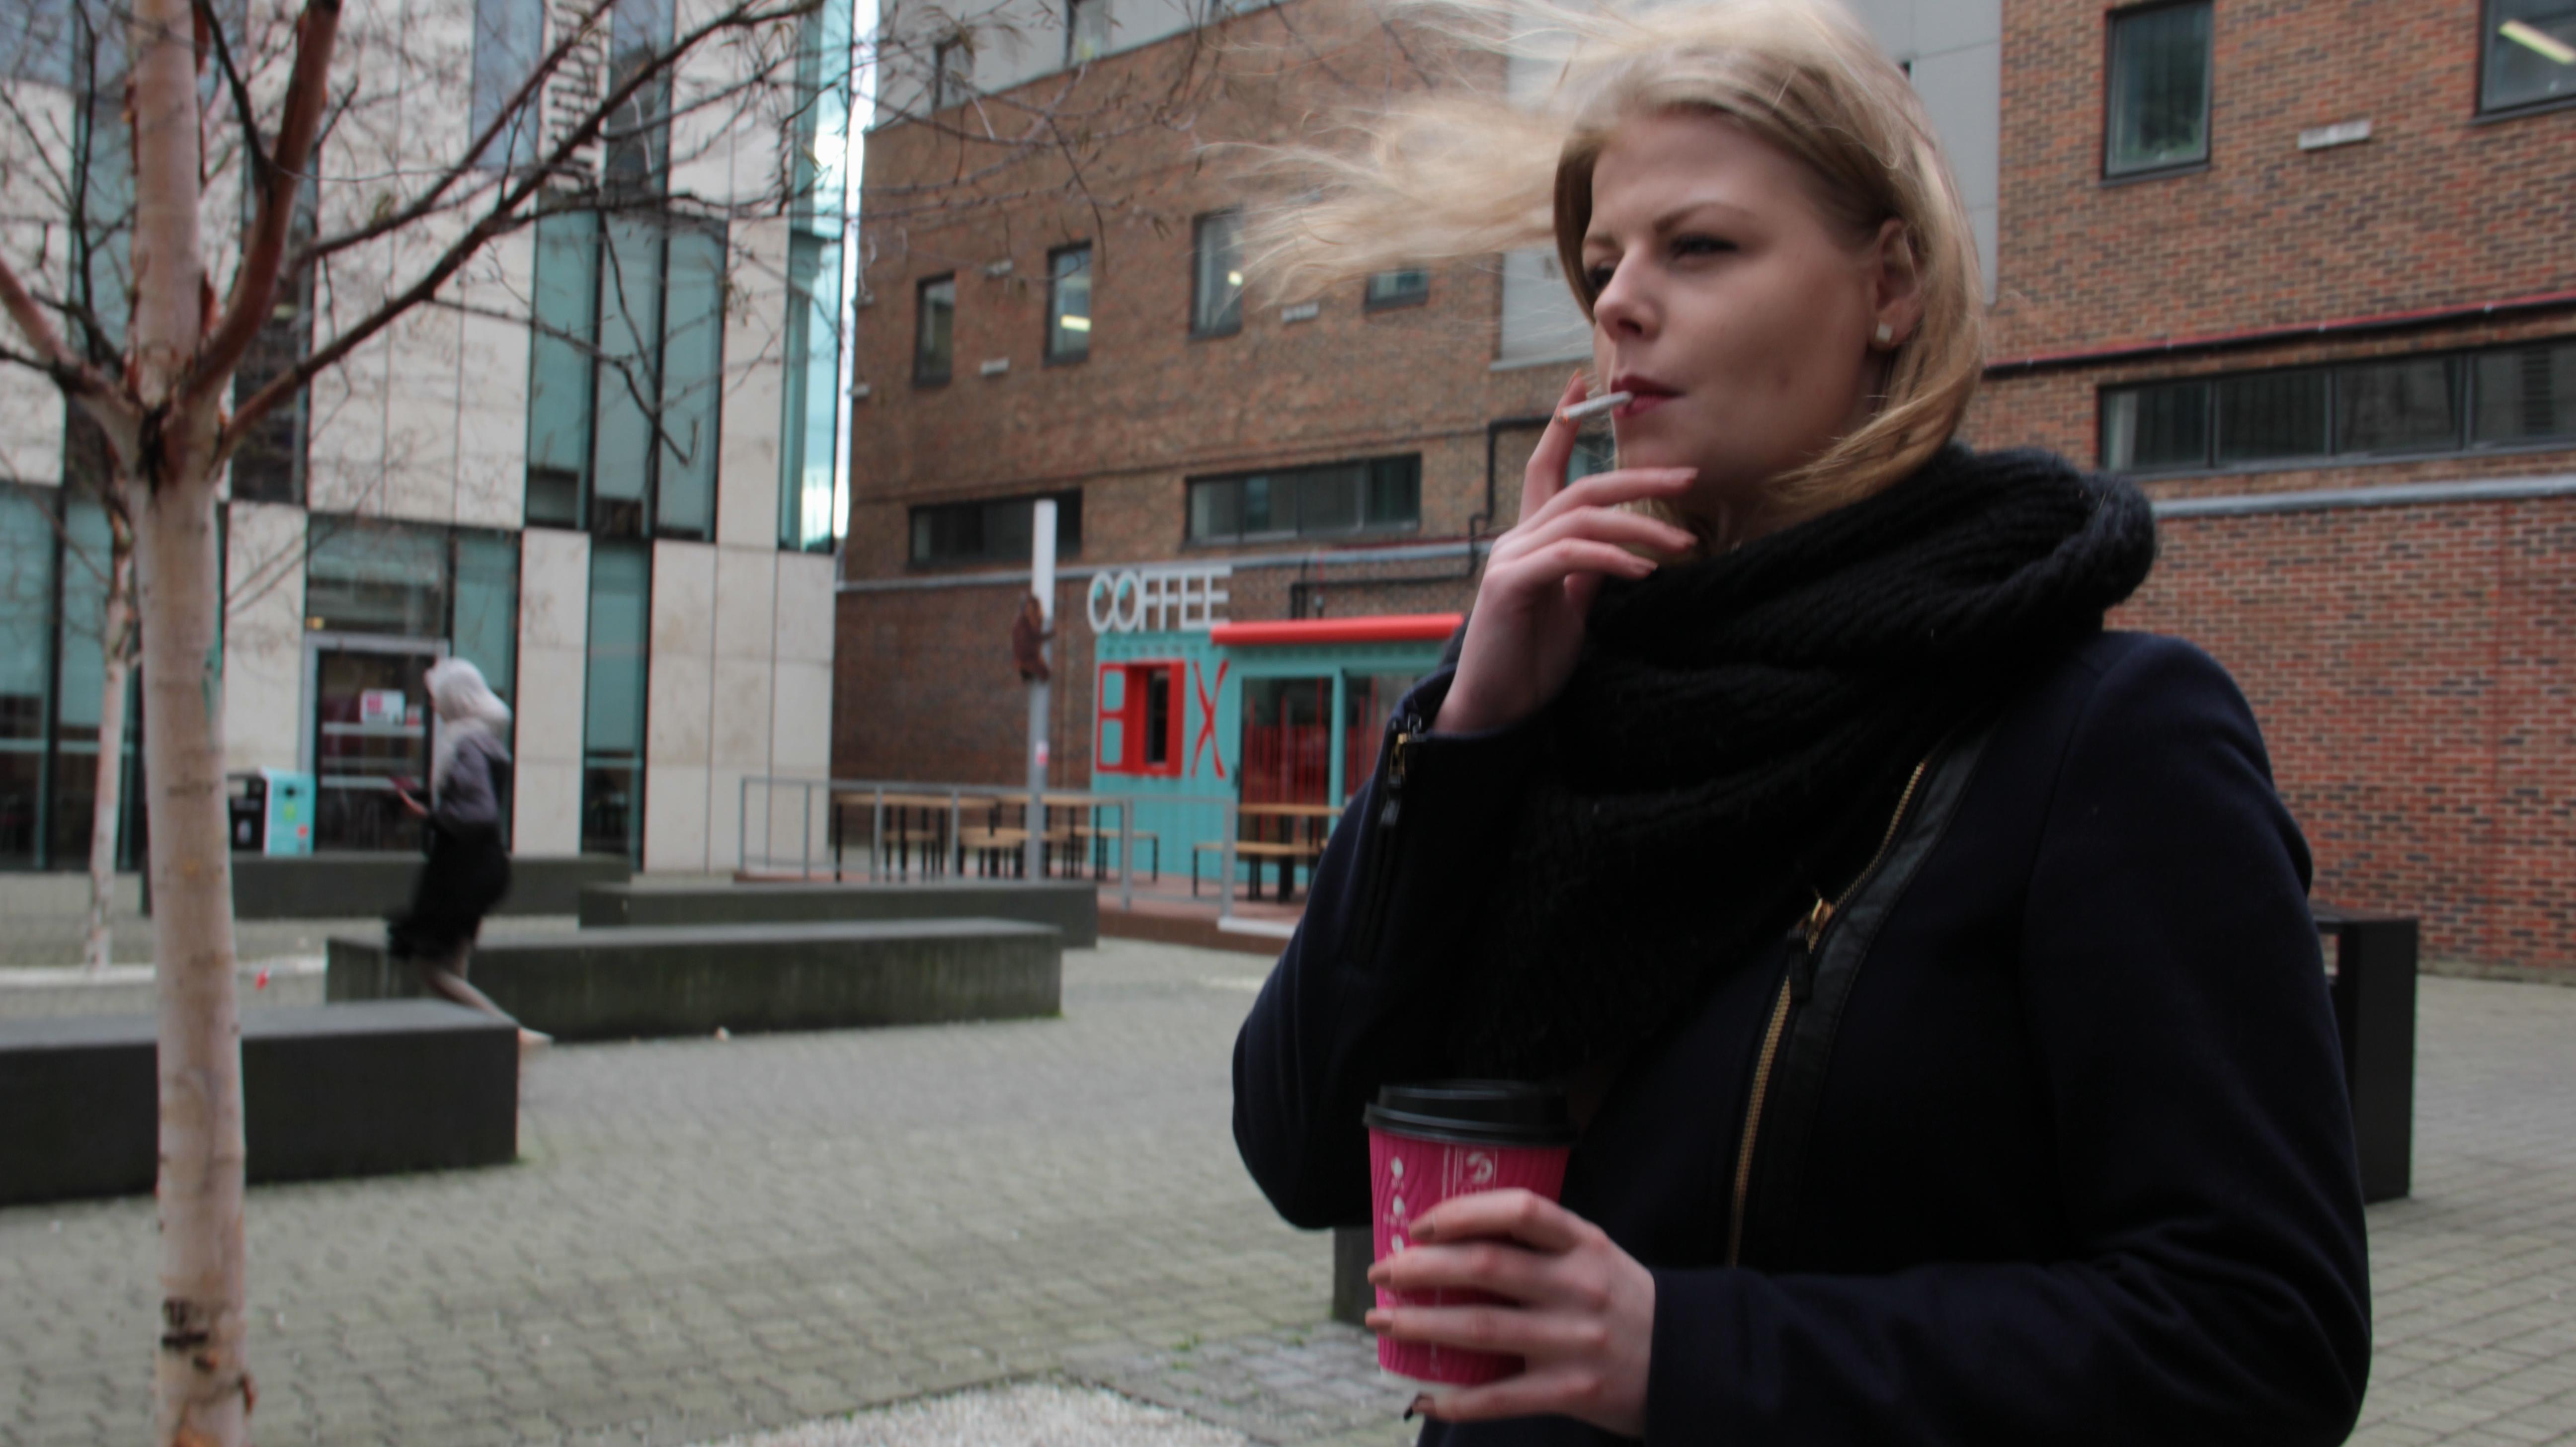 Kingston student smokers ignore JG courtyard cigarette ban